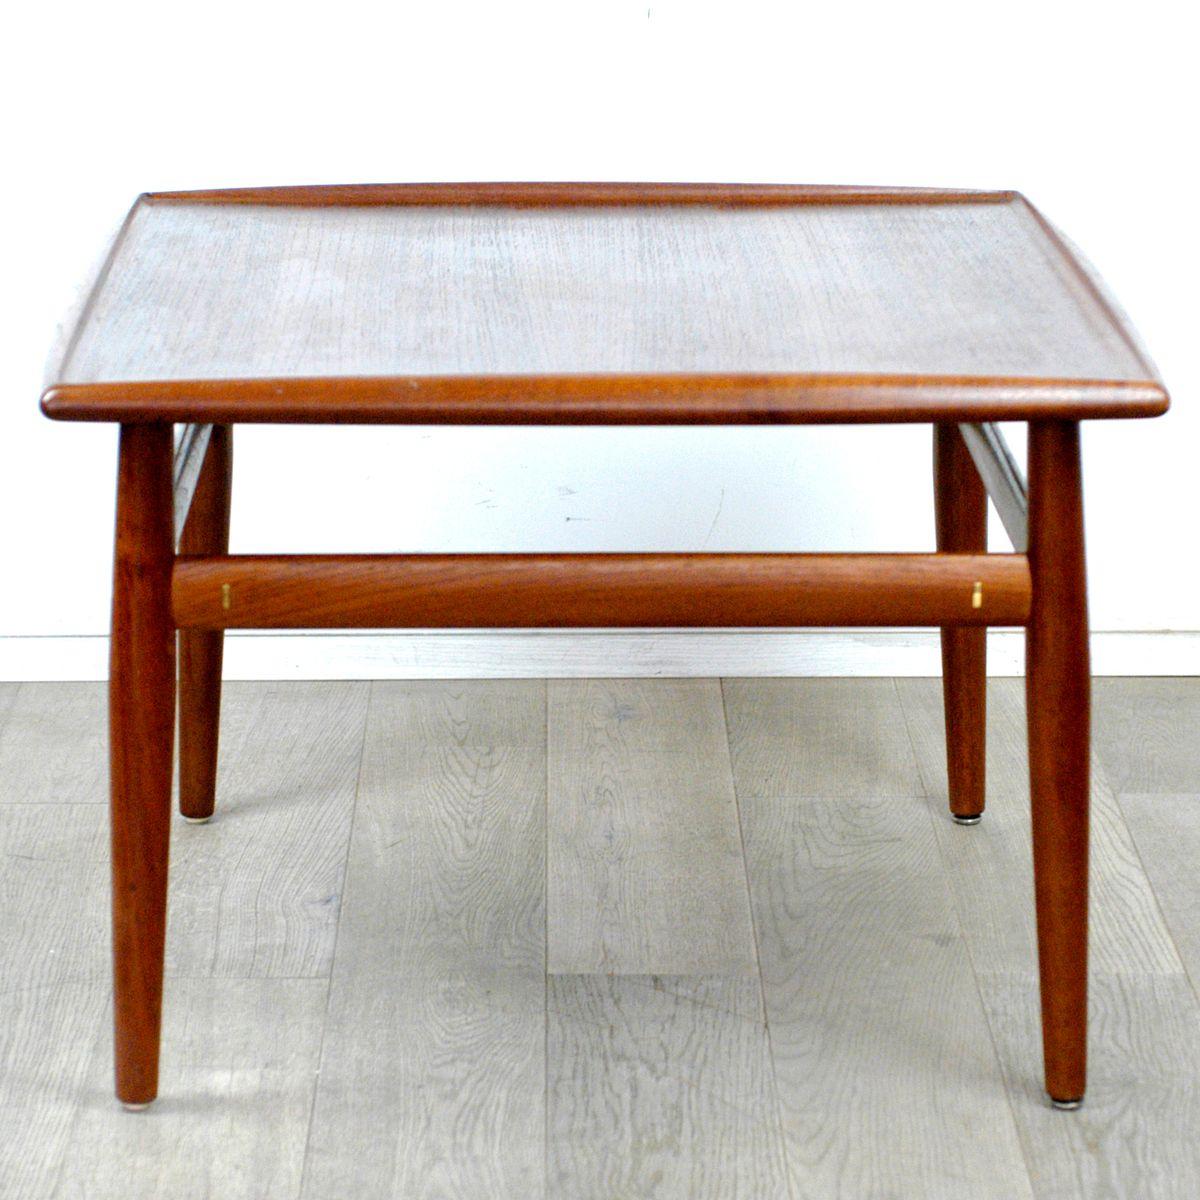 Danish Teak Coffee Table Grete Jalk For France Sn 1960s For inside size 1200 X 1200